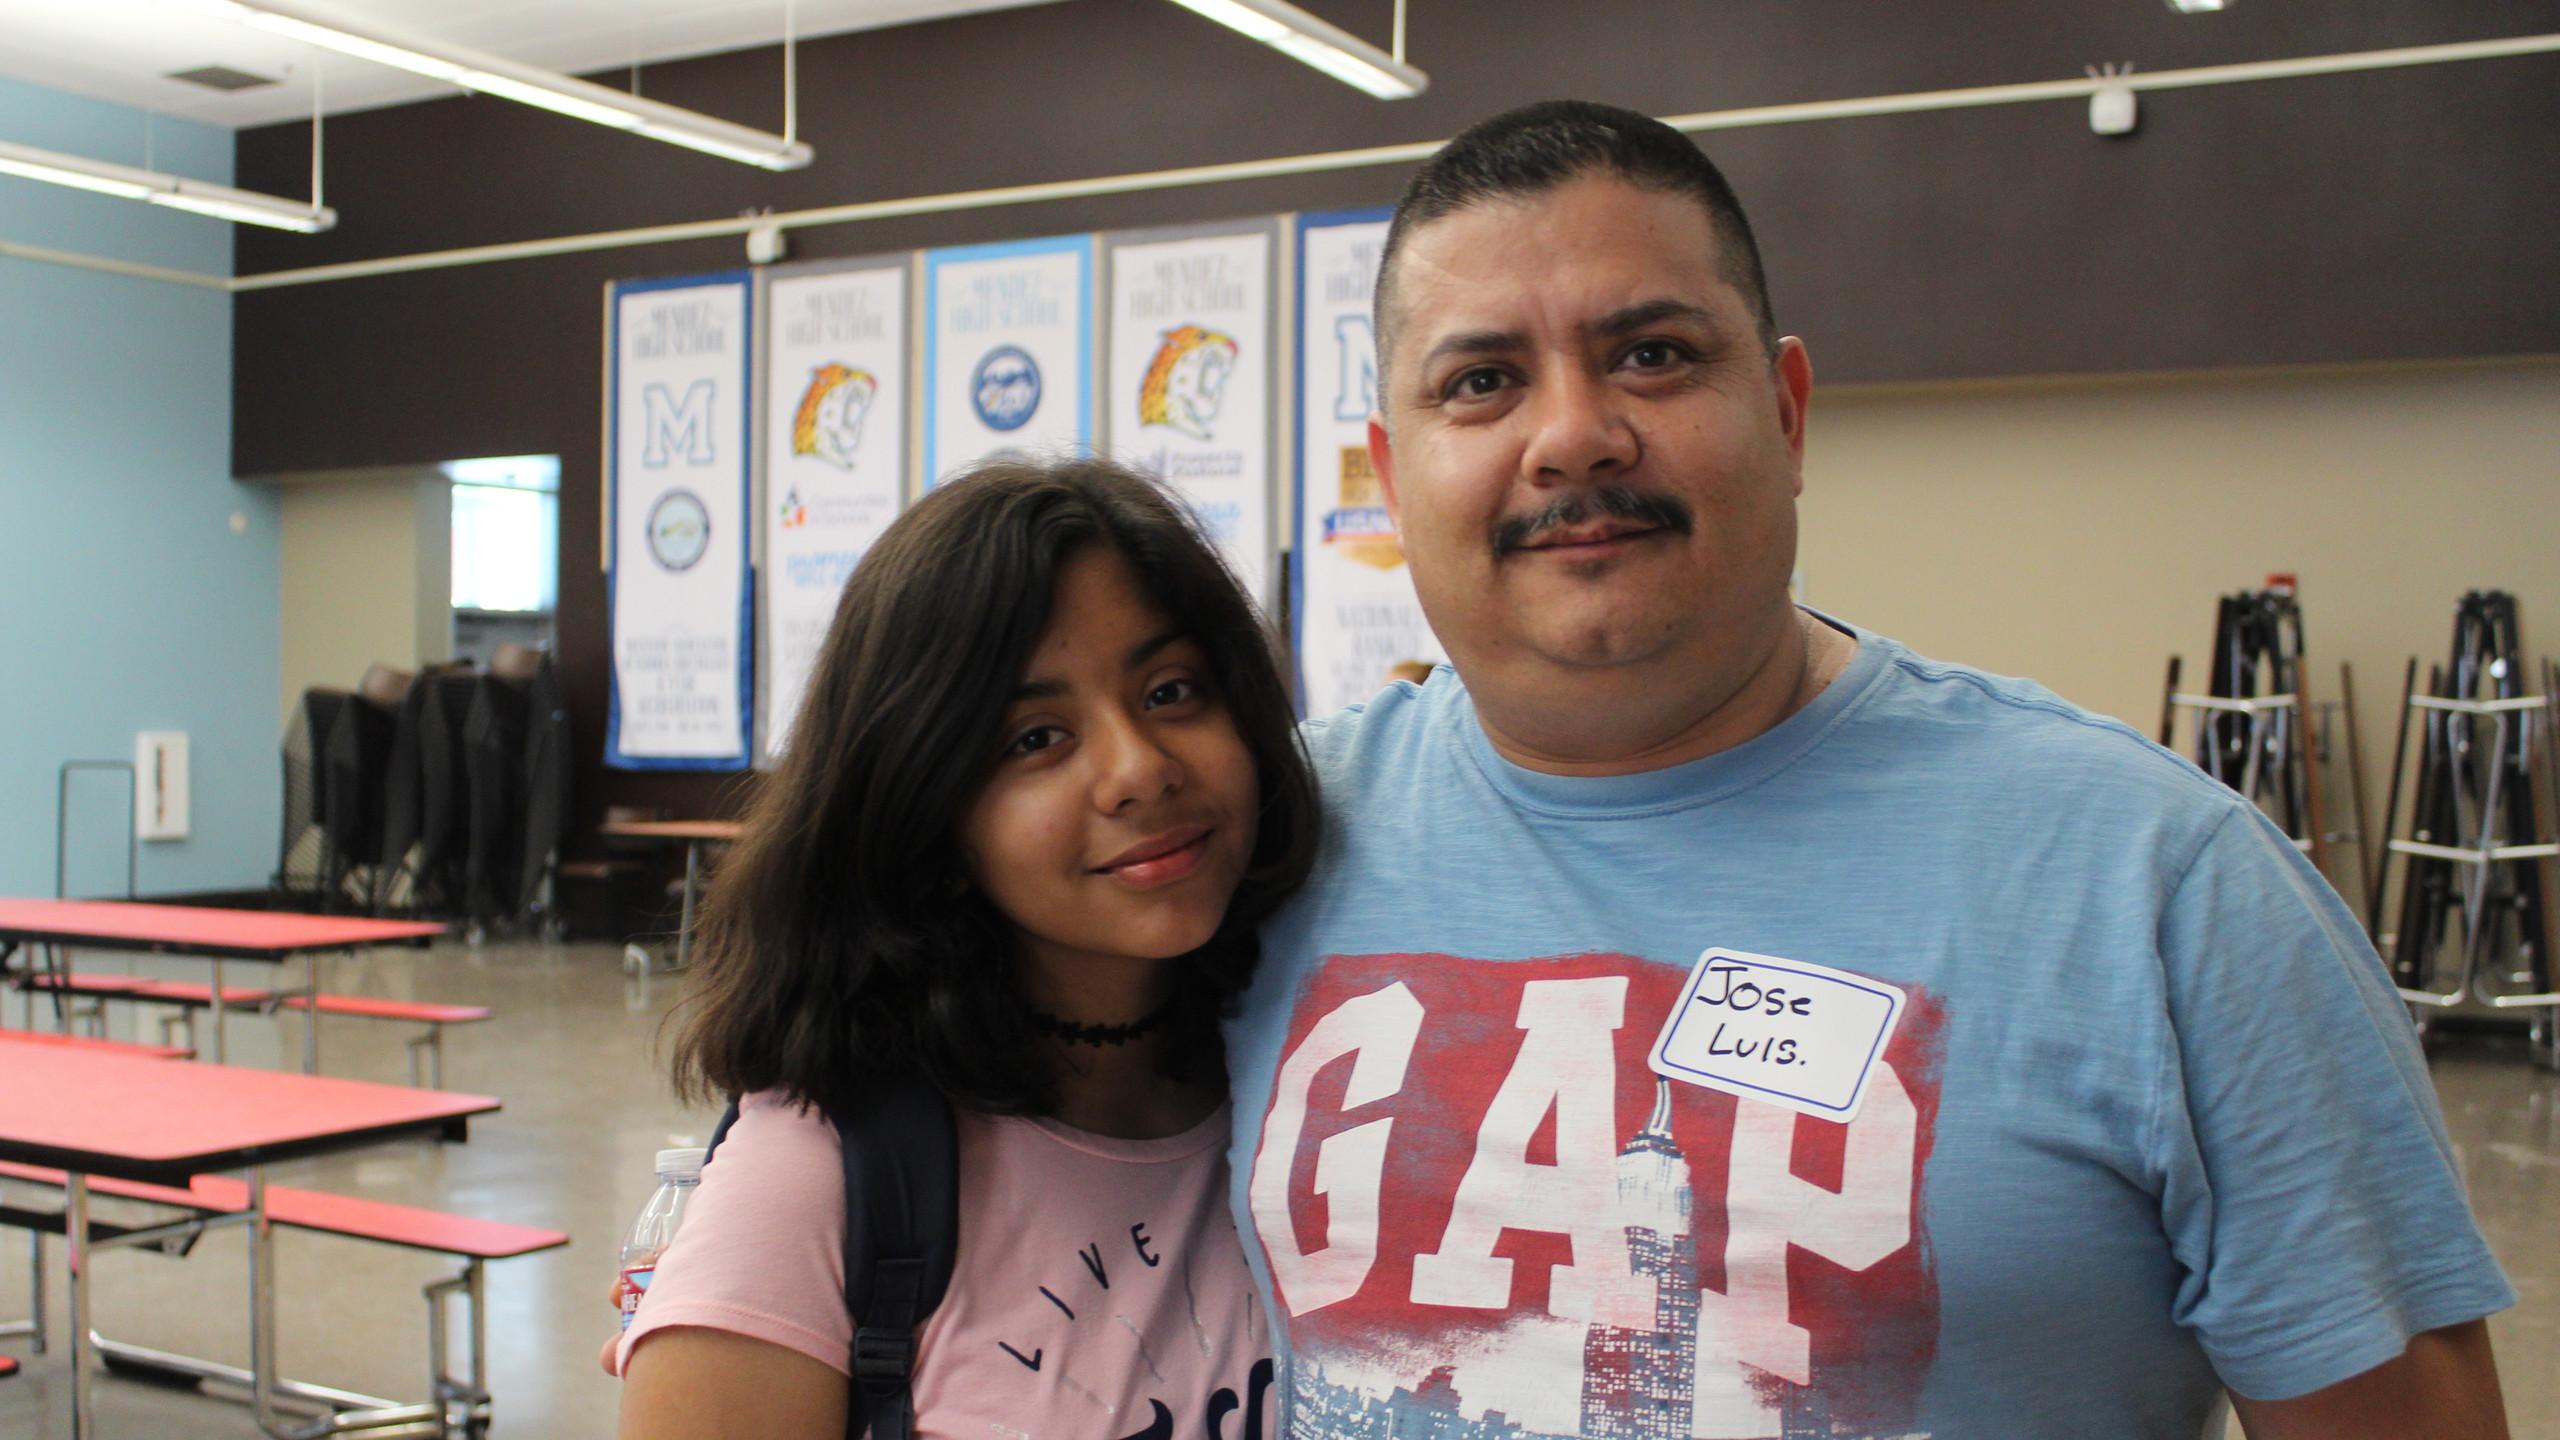 Incoming Mendez student and her dad at Summer Bridge 2017.